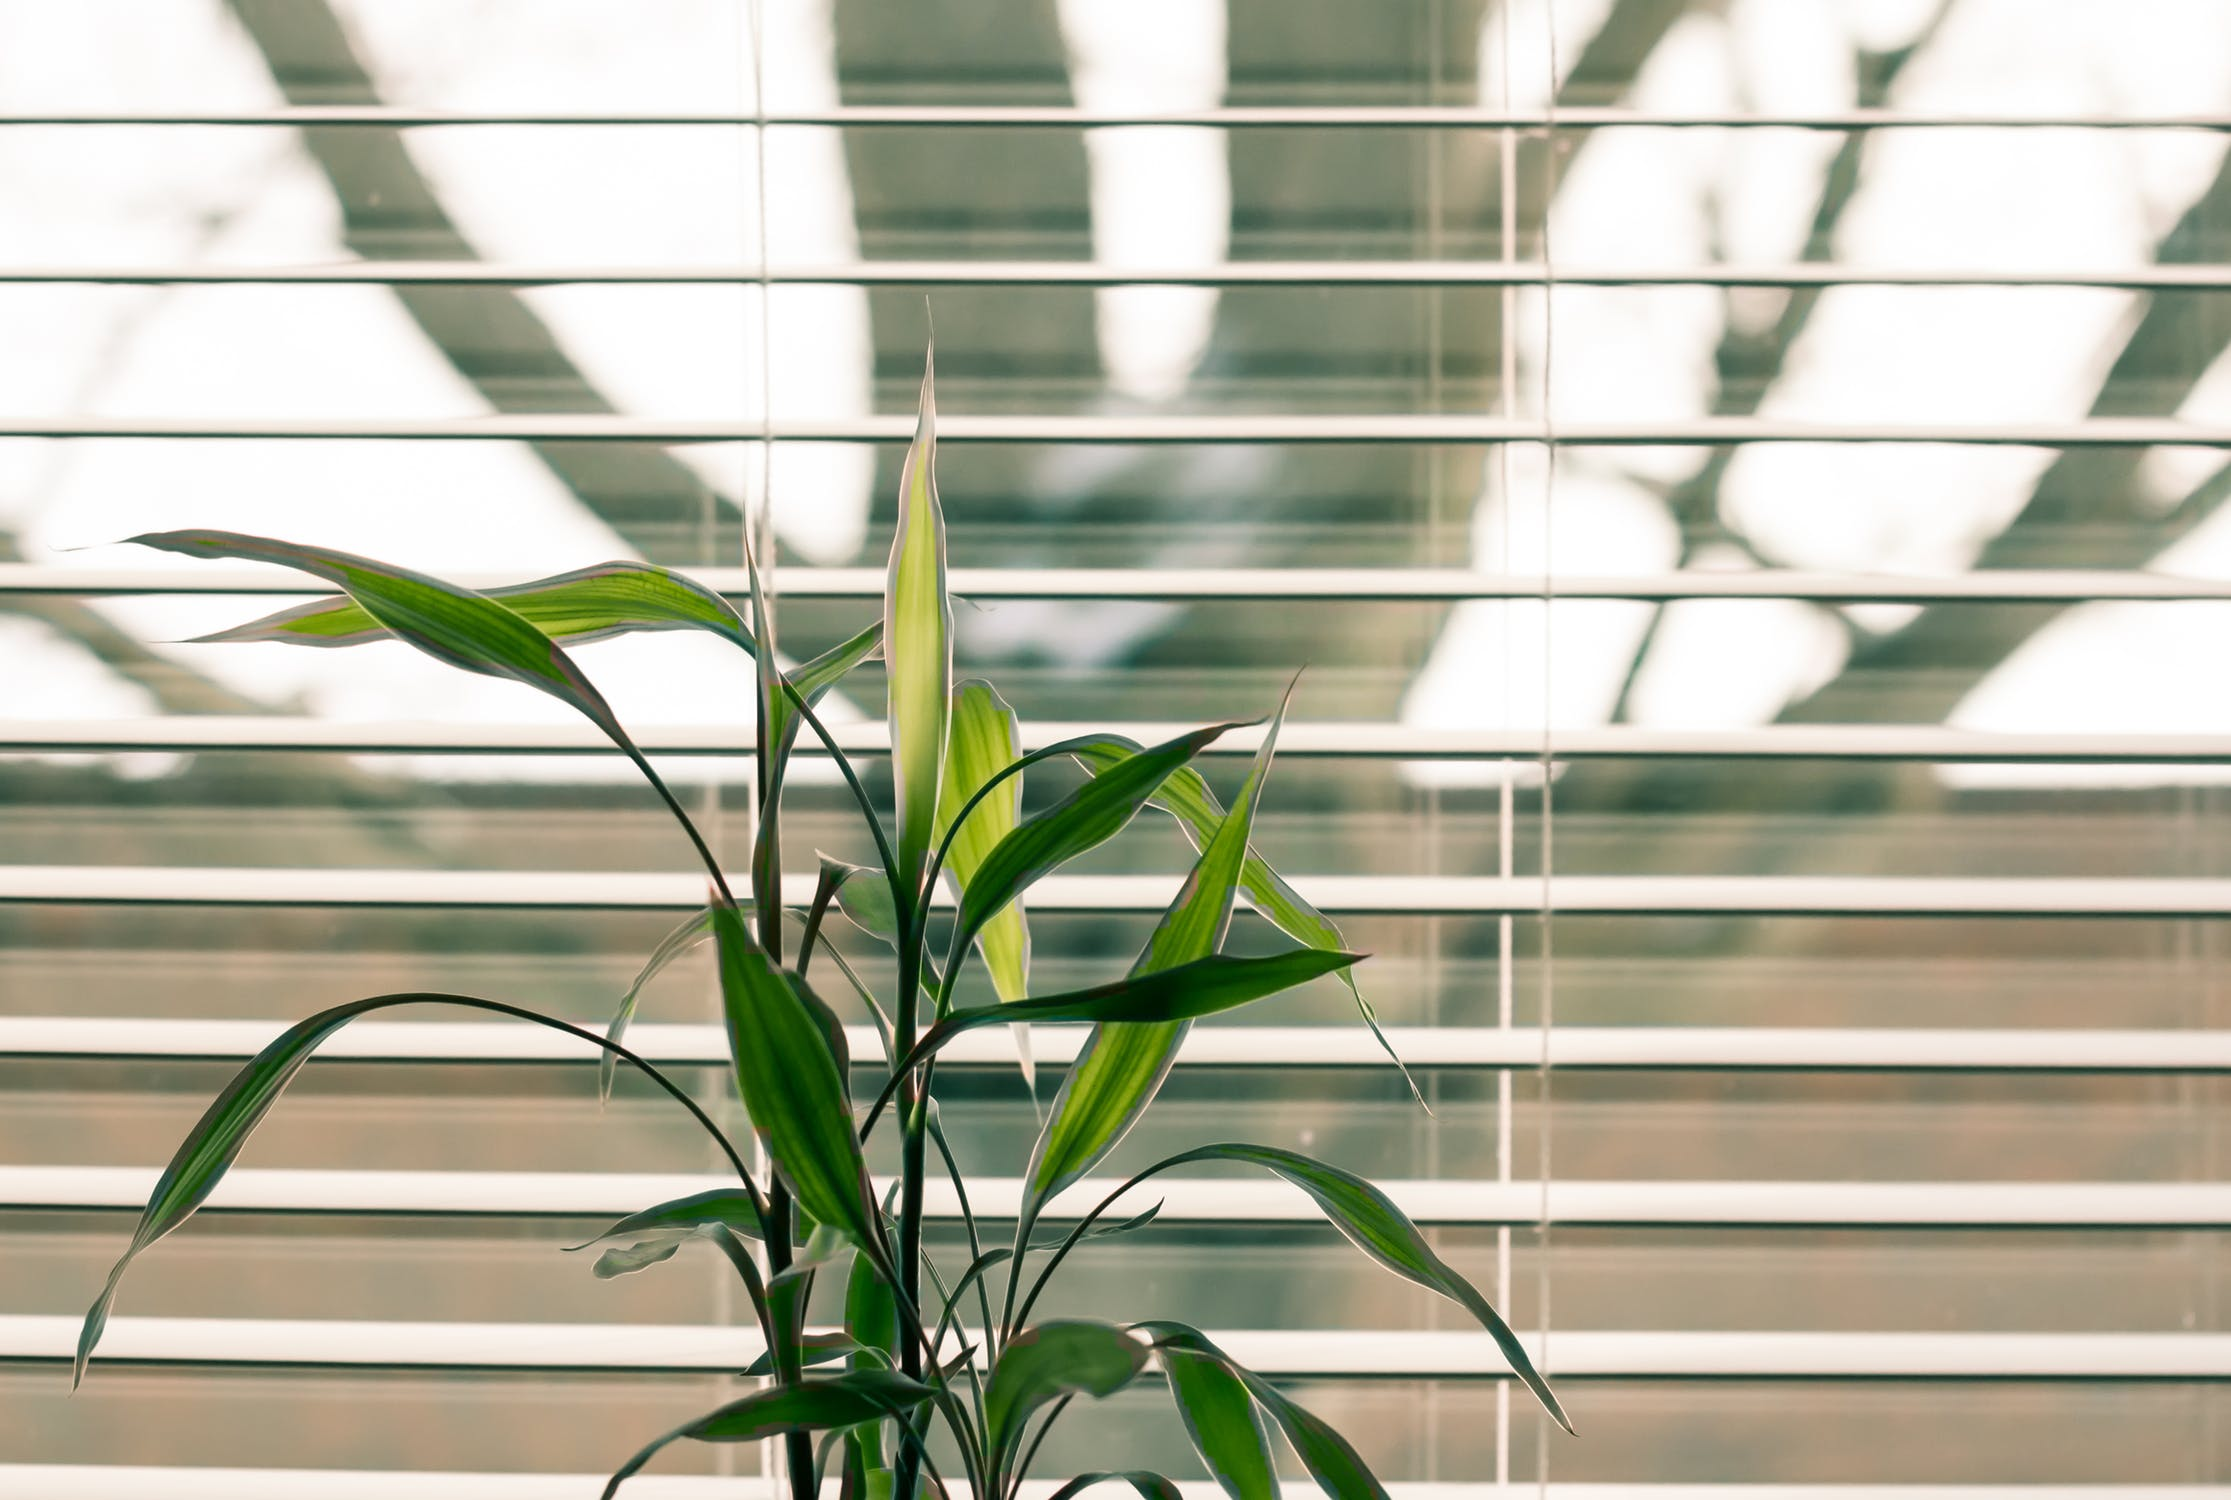 Image of open window blinds